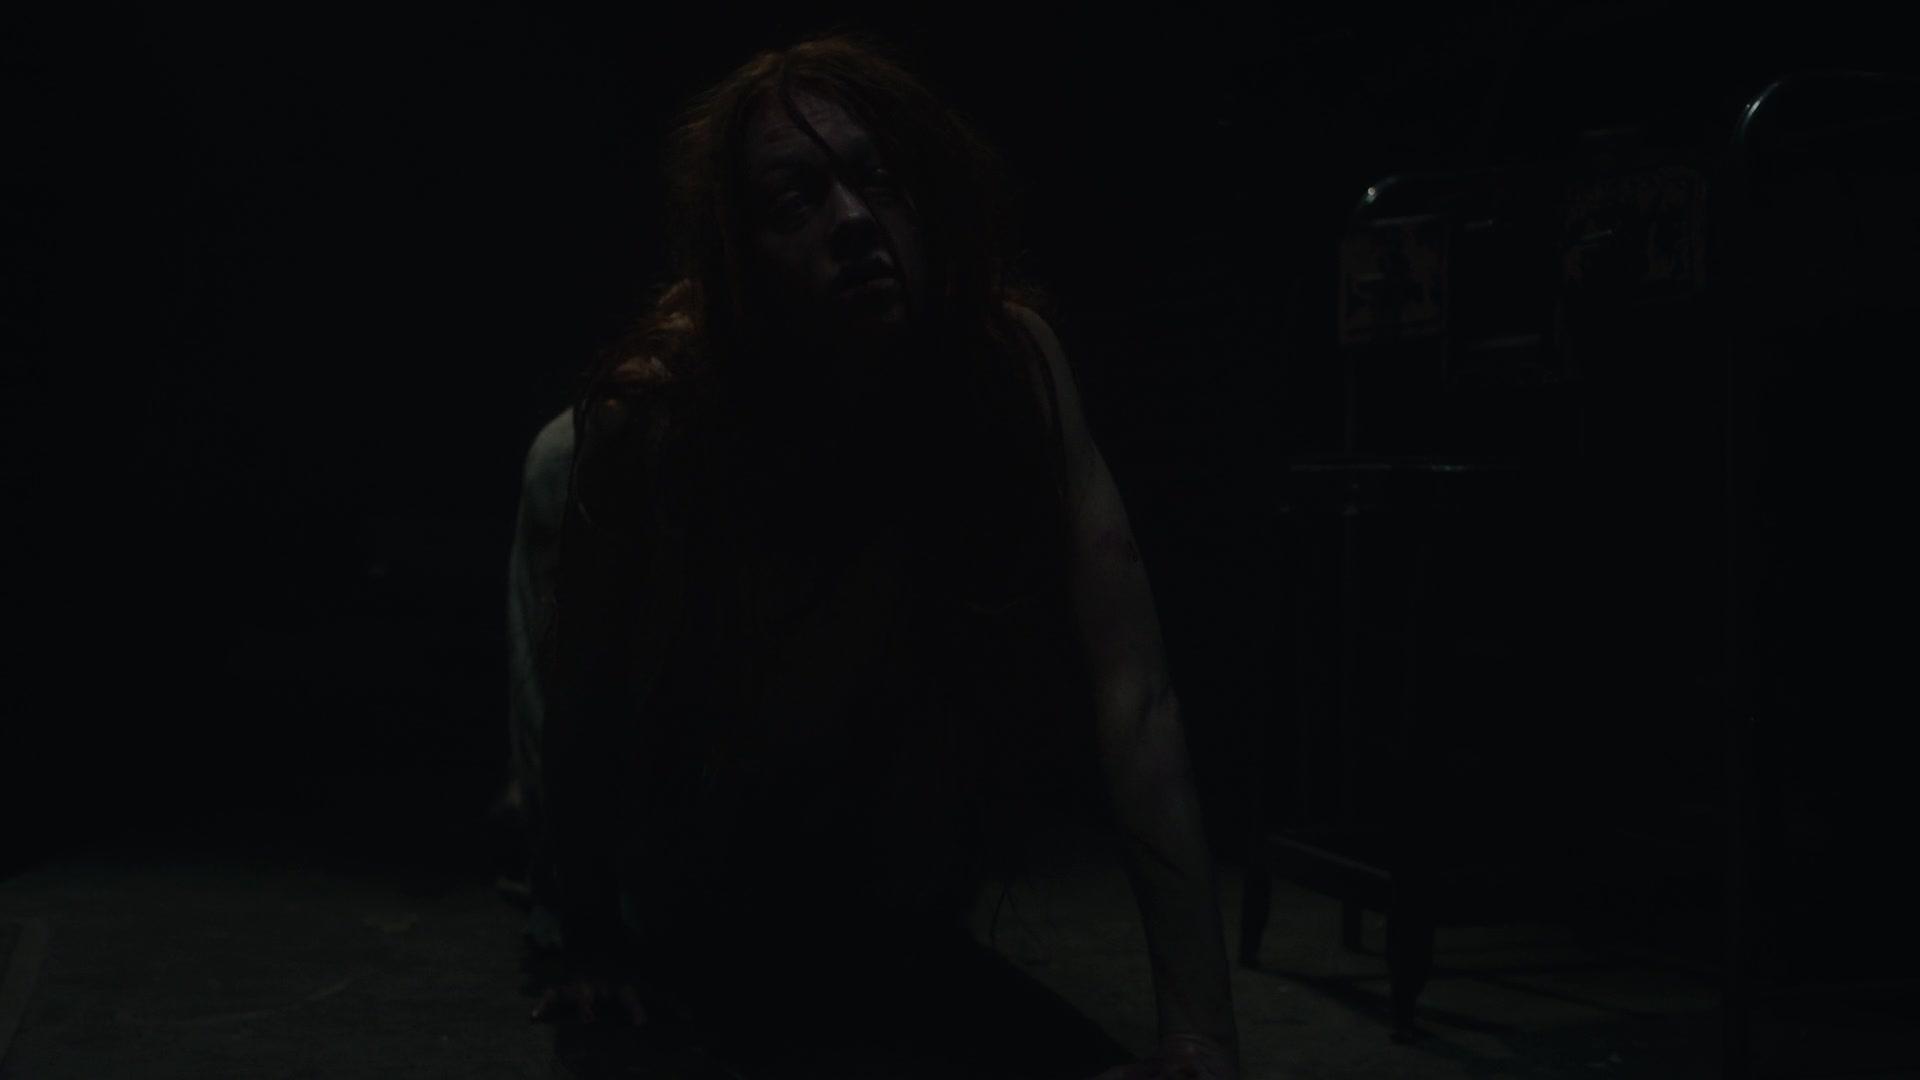 Haunted S01